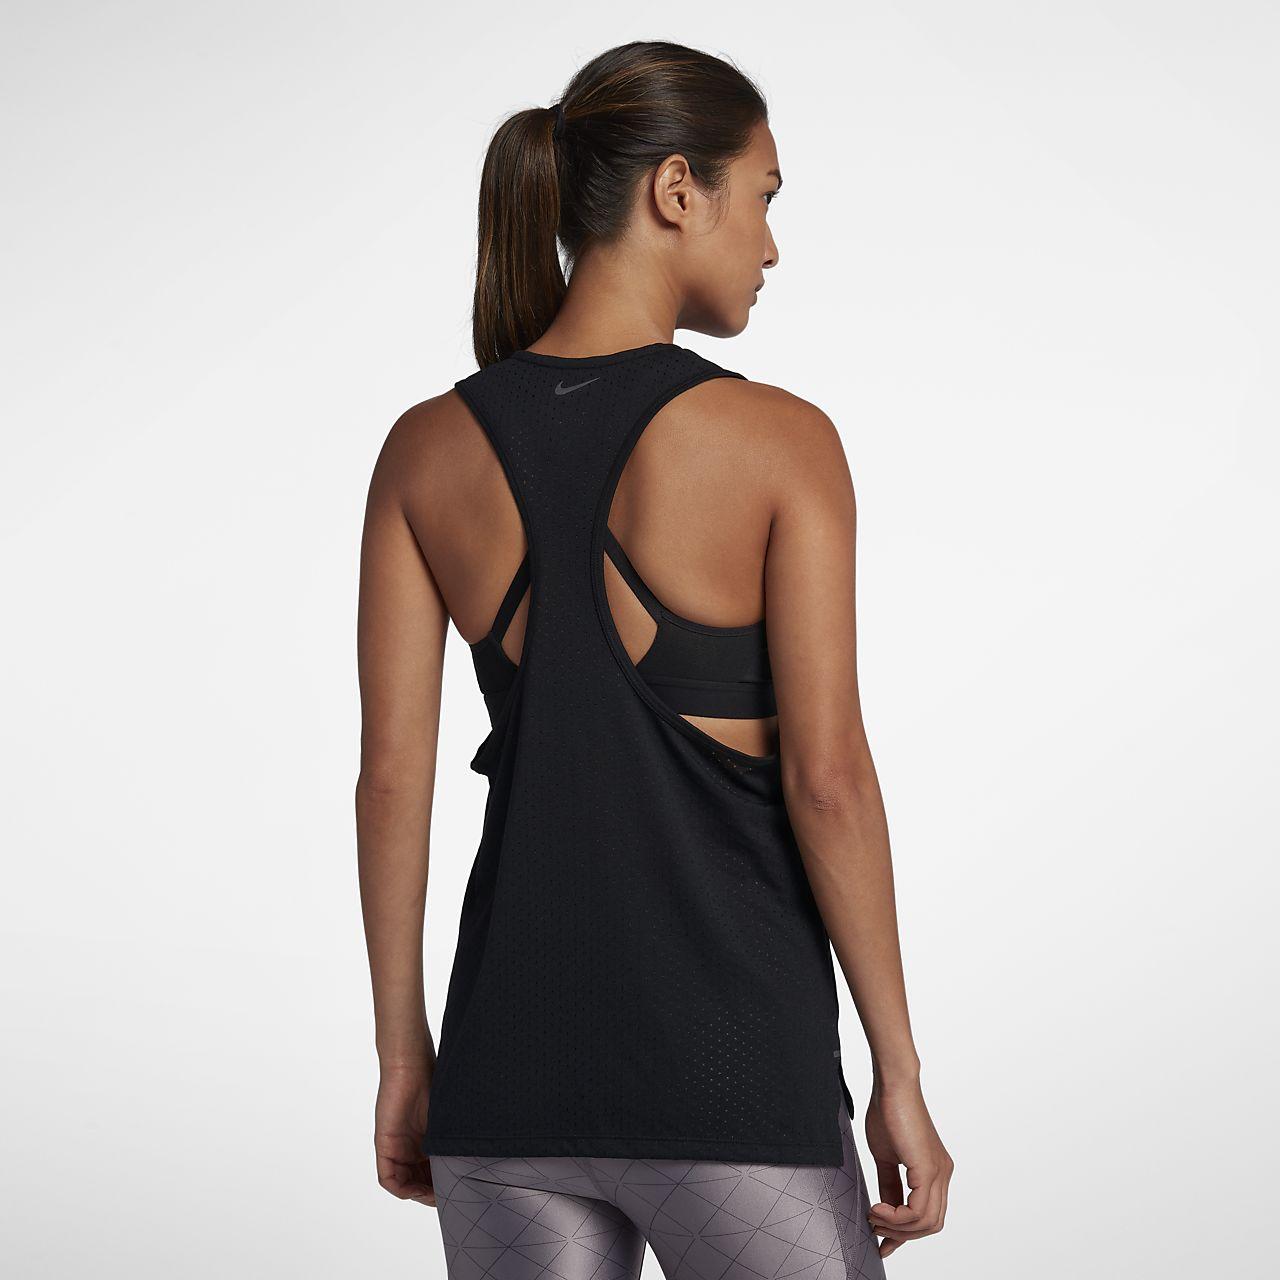 Tailwind Mujer Tirantes Run Running De Nike Para Camiseta FY7wn 2a91175ed237c